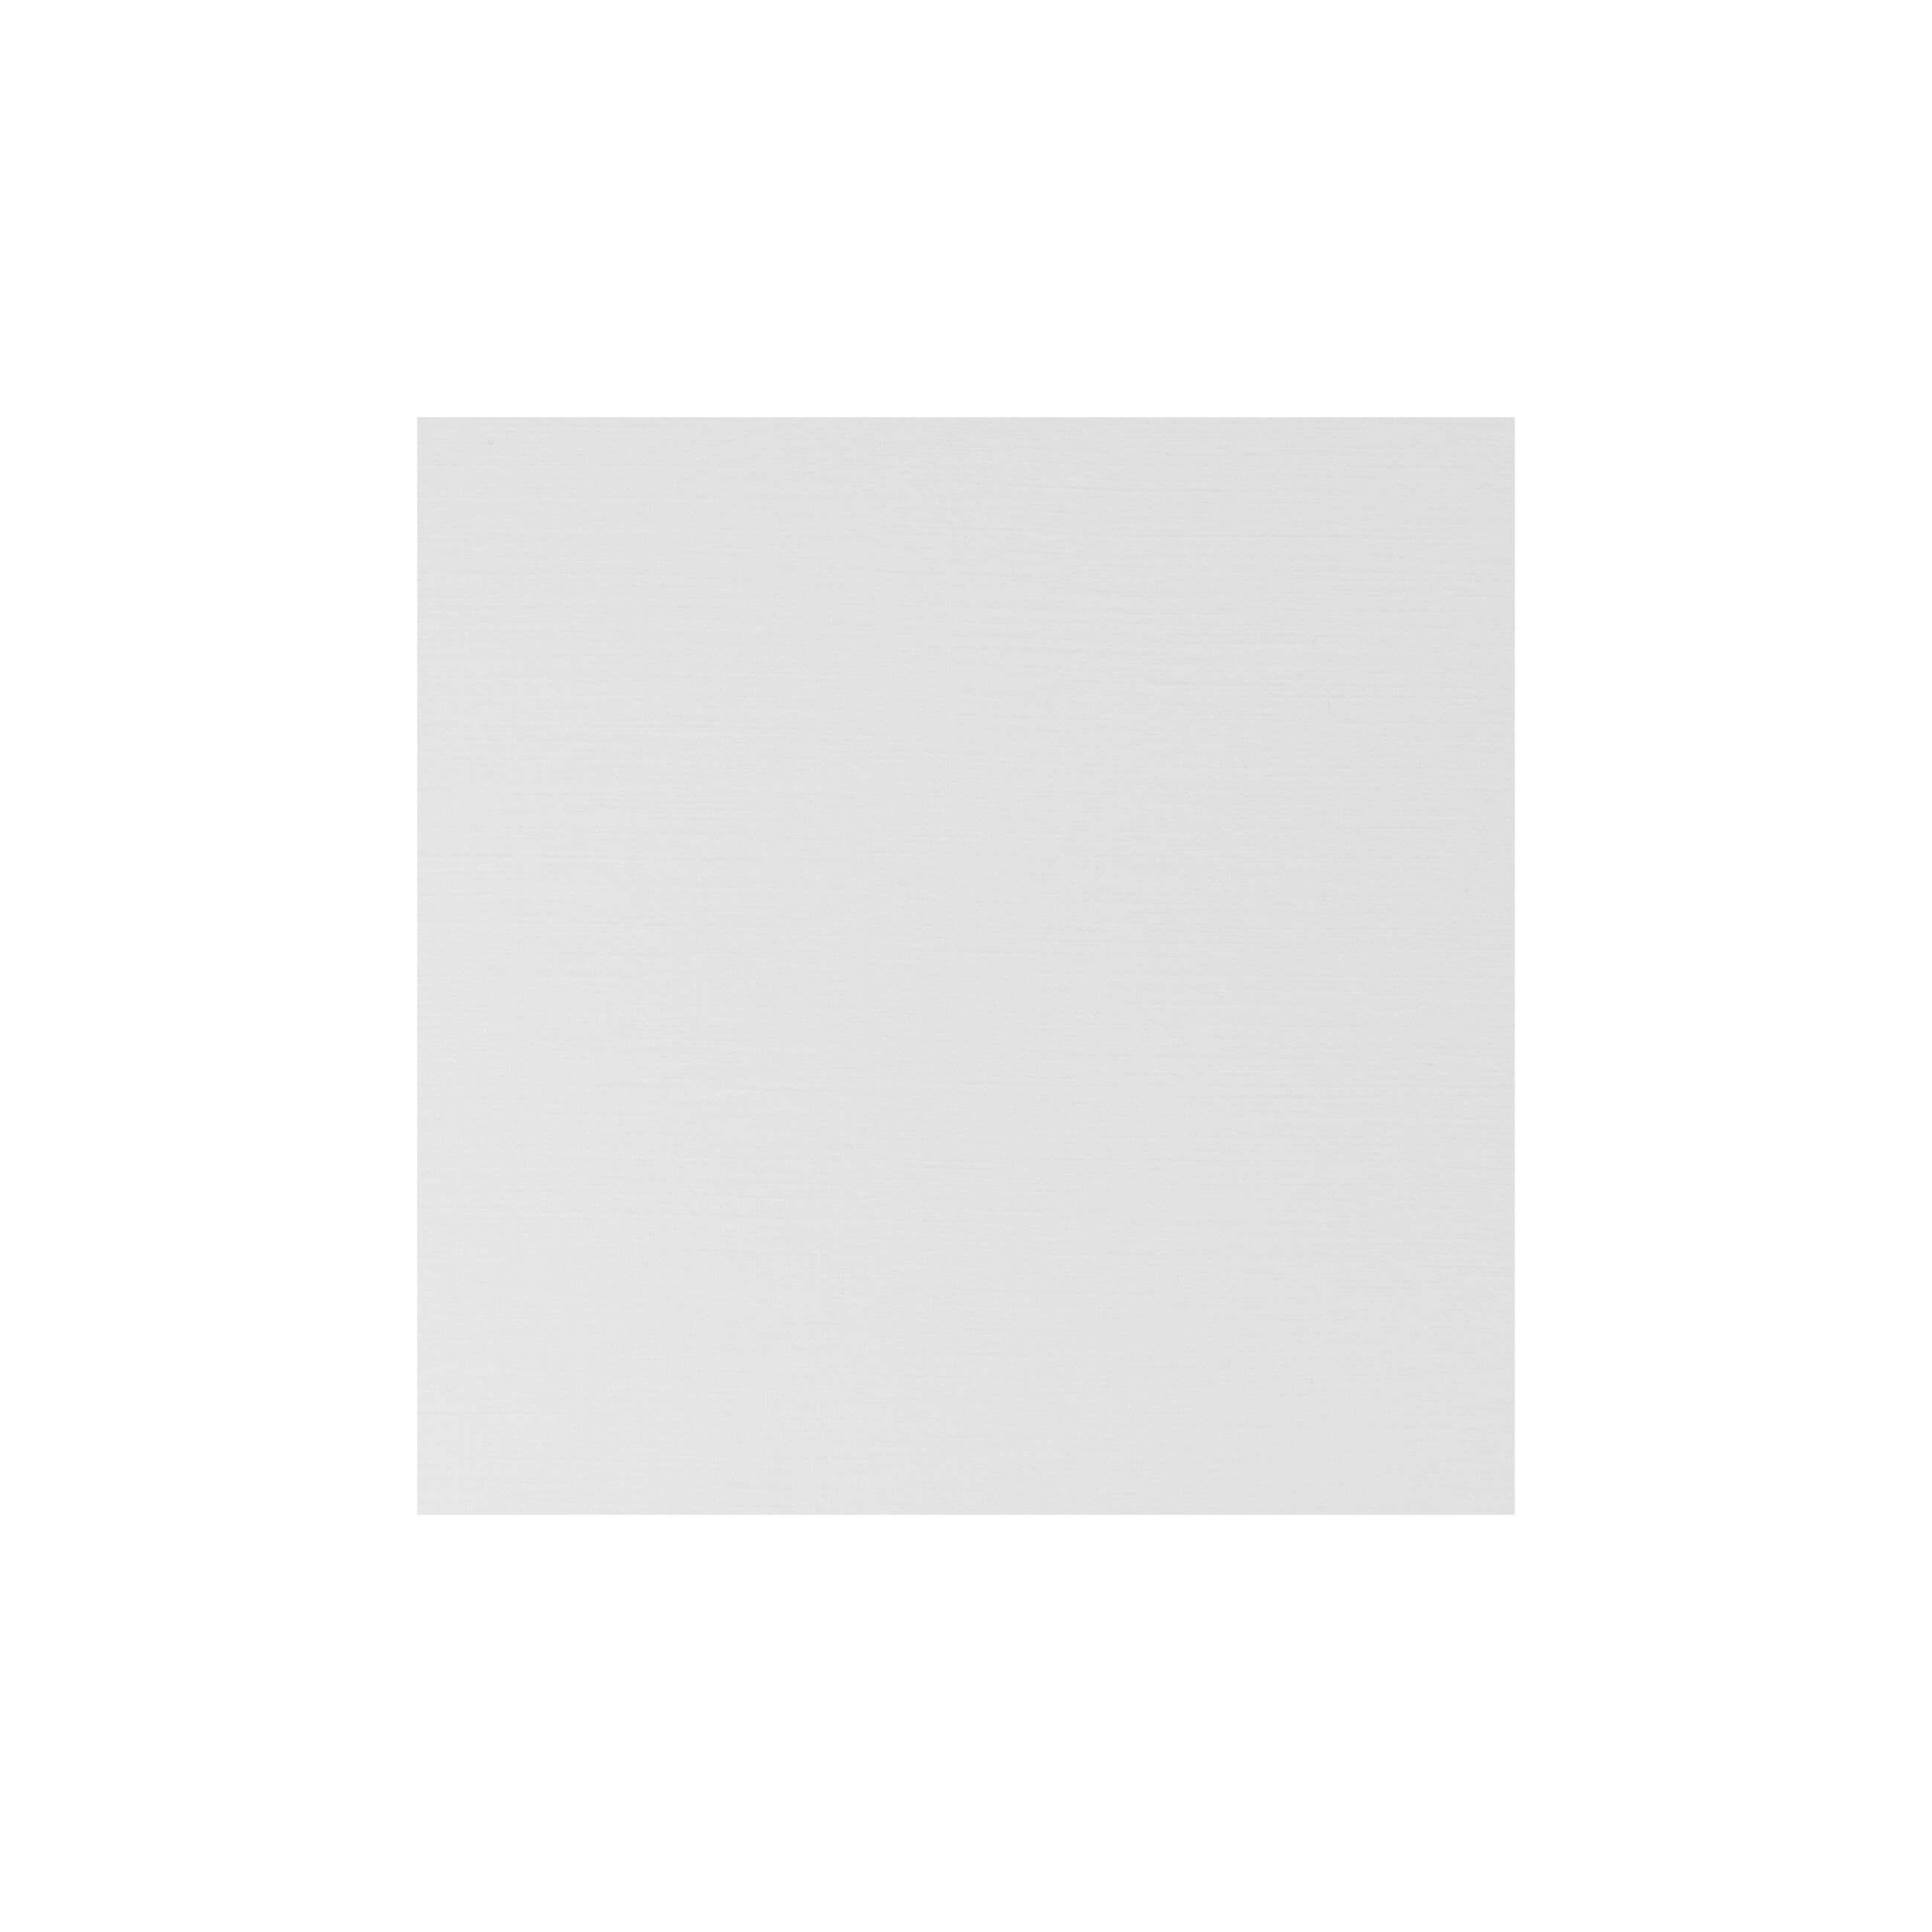 Cardstock 125mm Square - Silkweave White